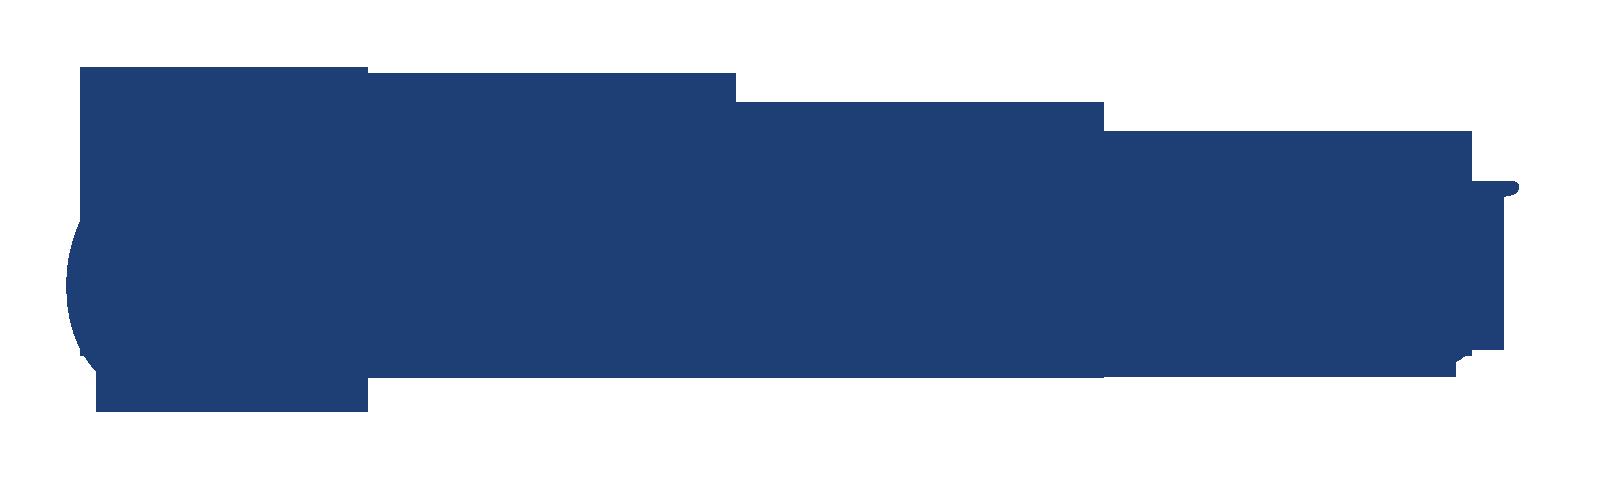 Cristalnet